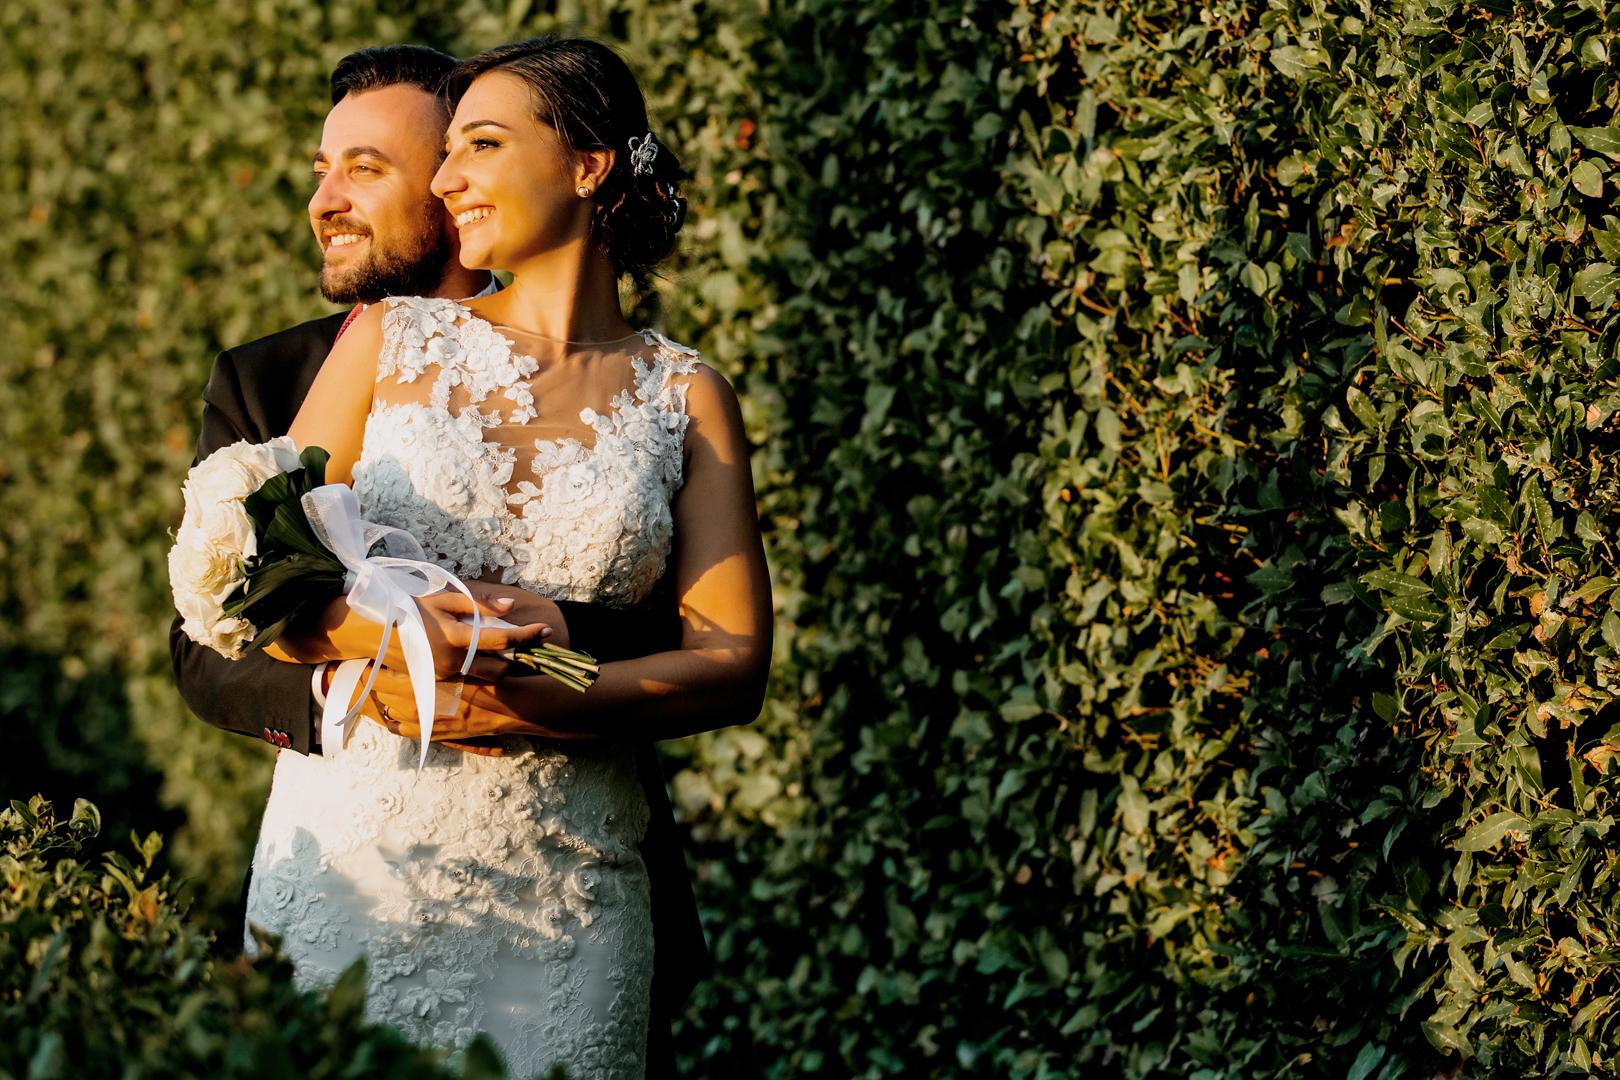 58 gianni-lepore-weddingday-matrimonio-new-lions-molfetta-esterna-fotografo-lucera